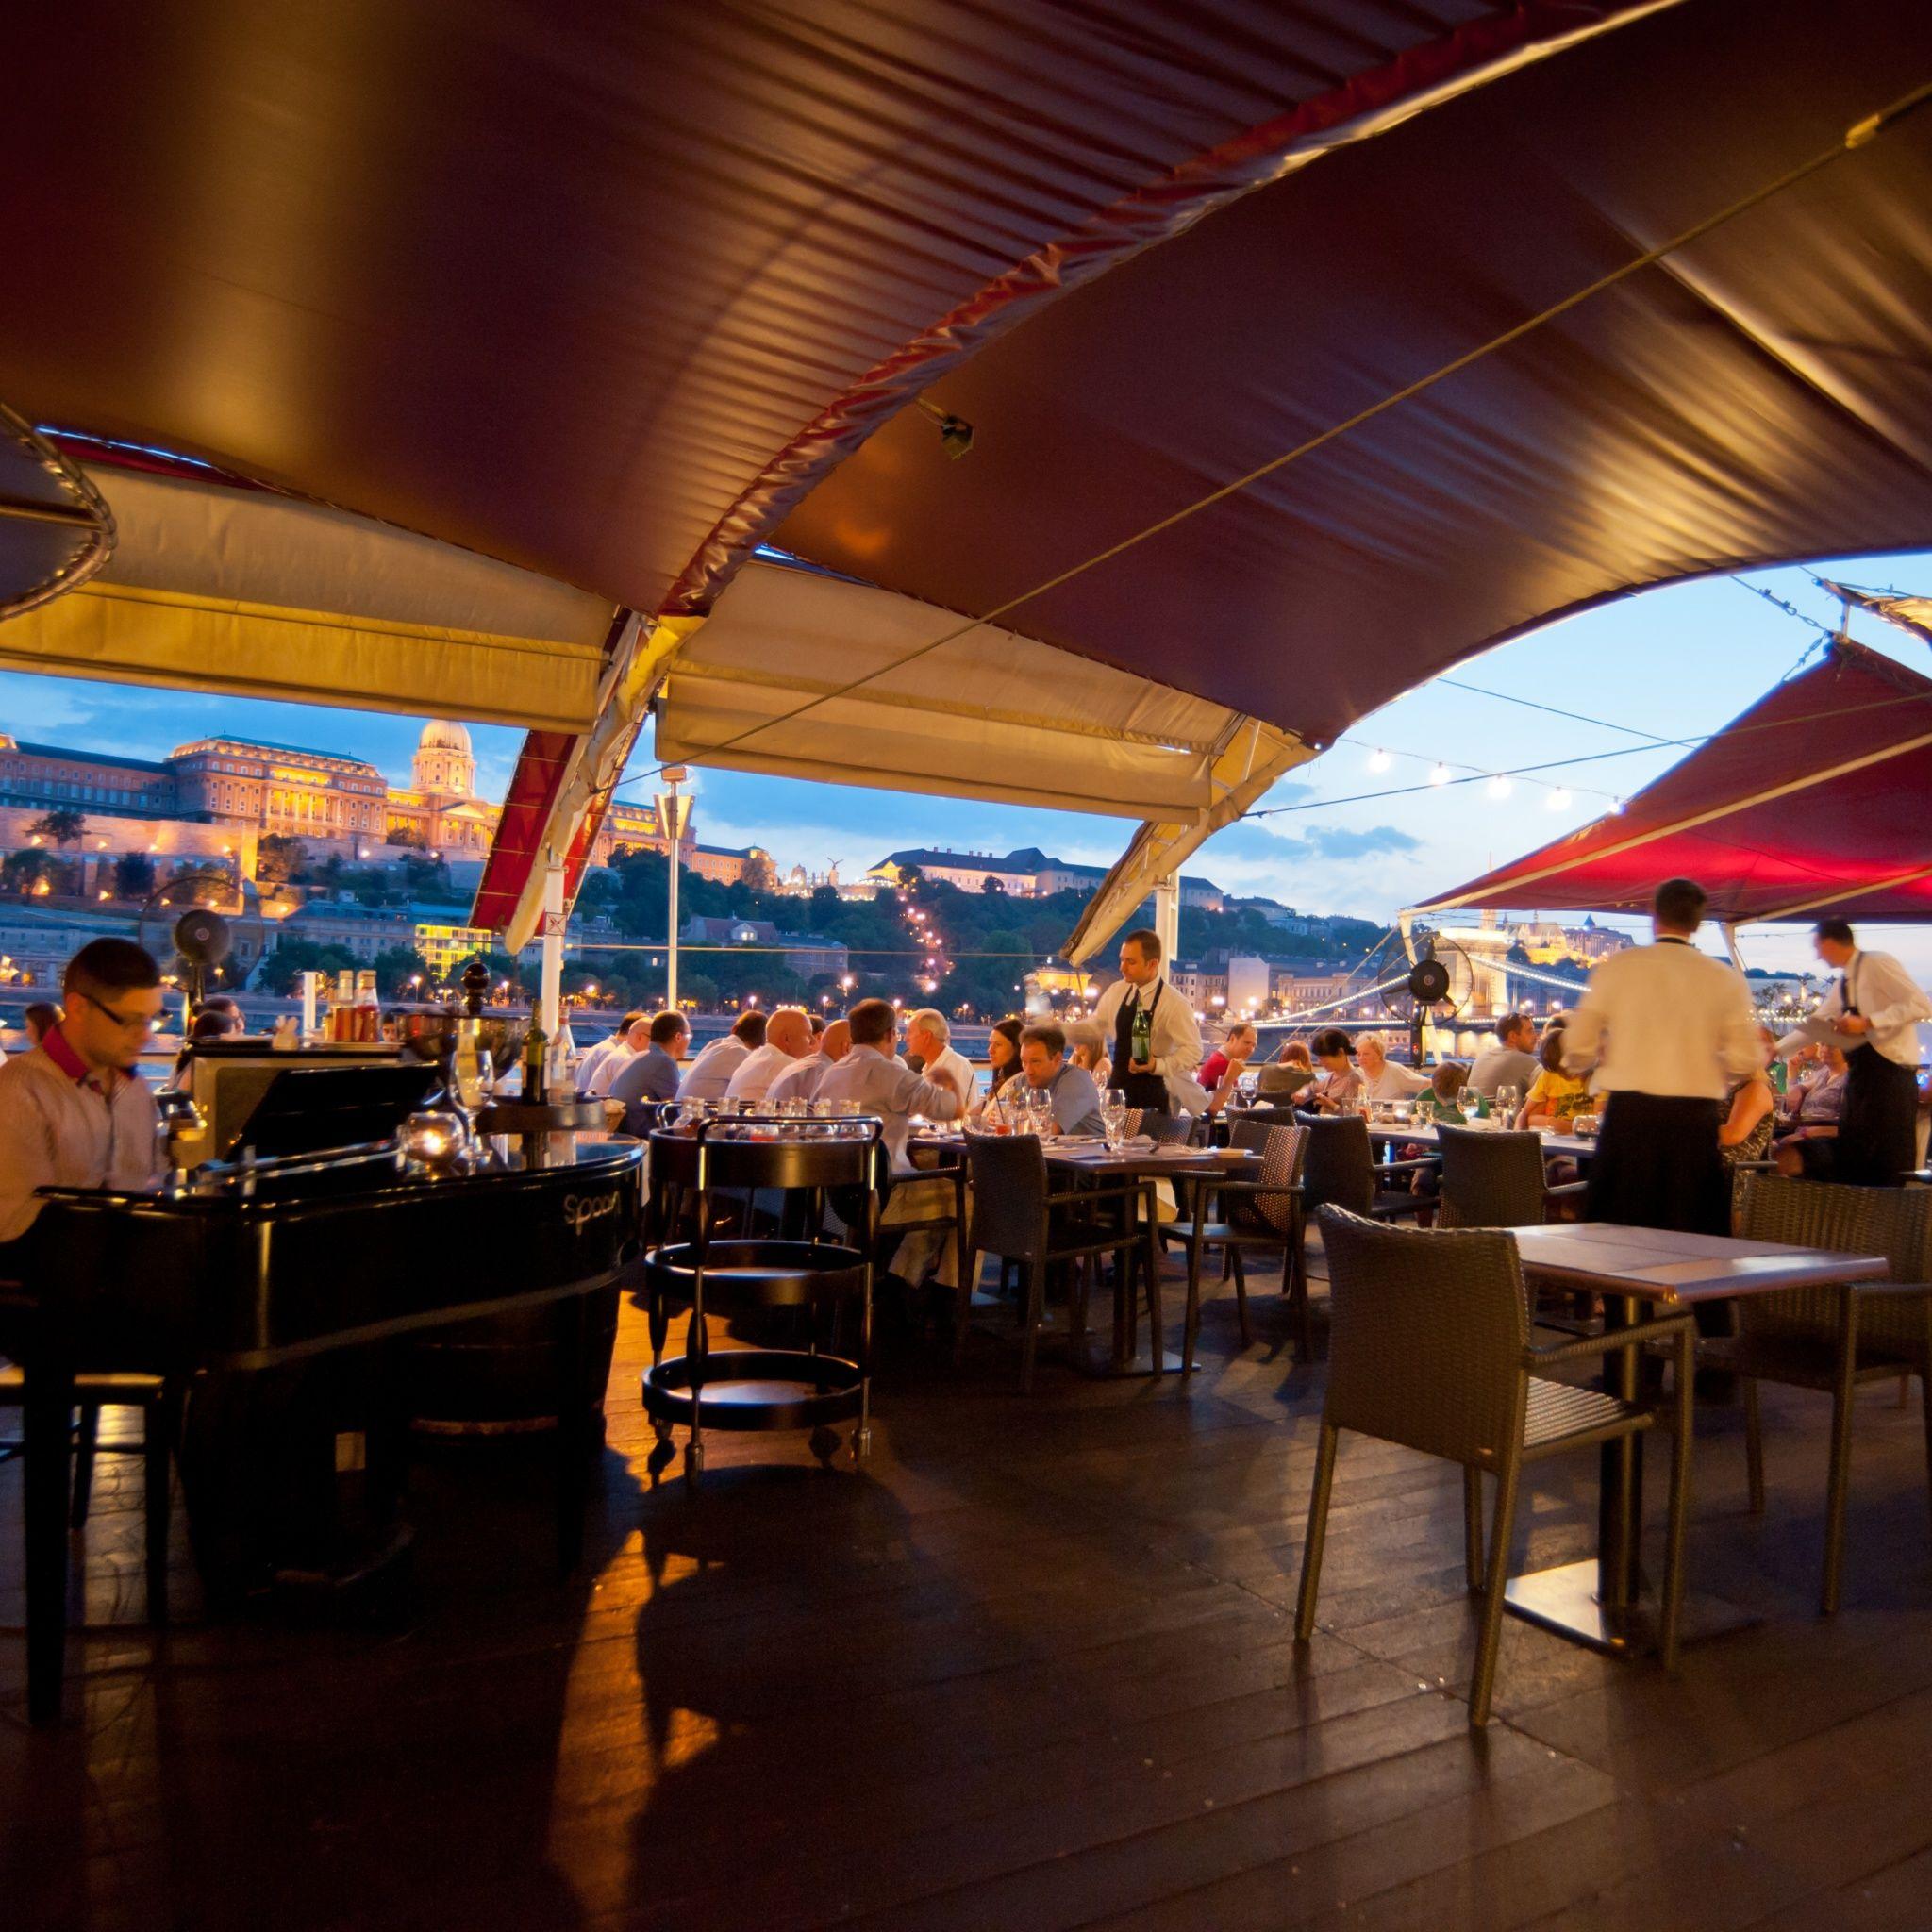 Spoon The Boat Budapest - Luonge terasz